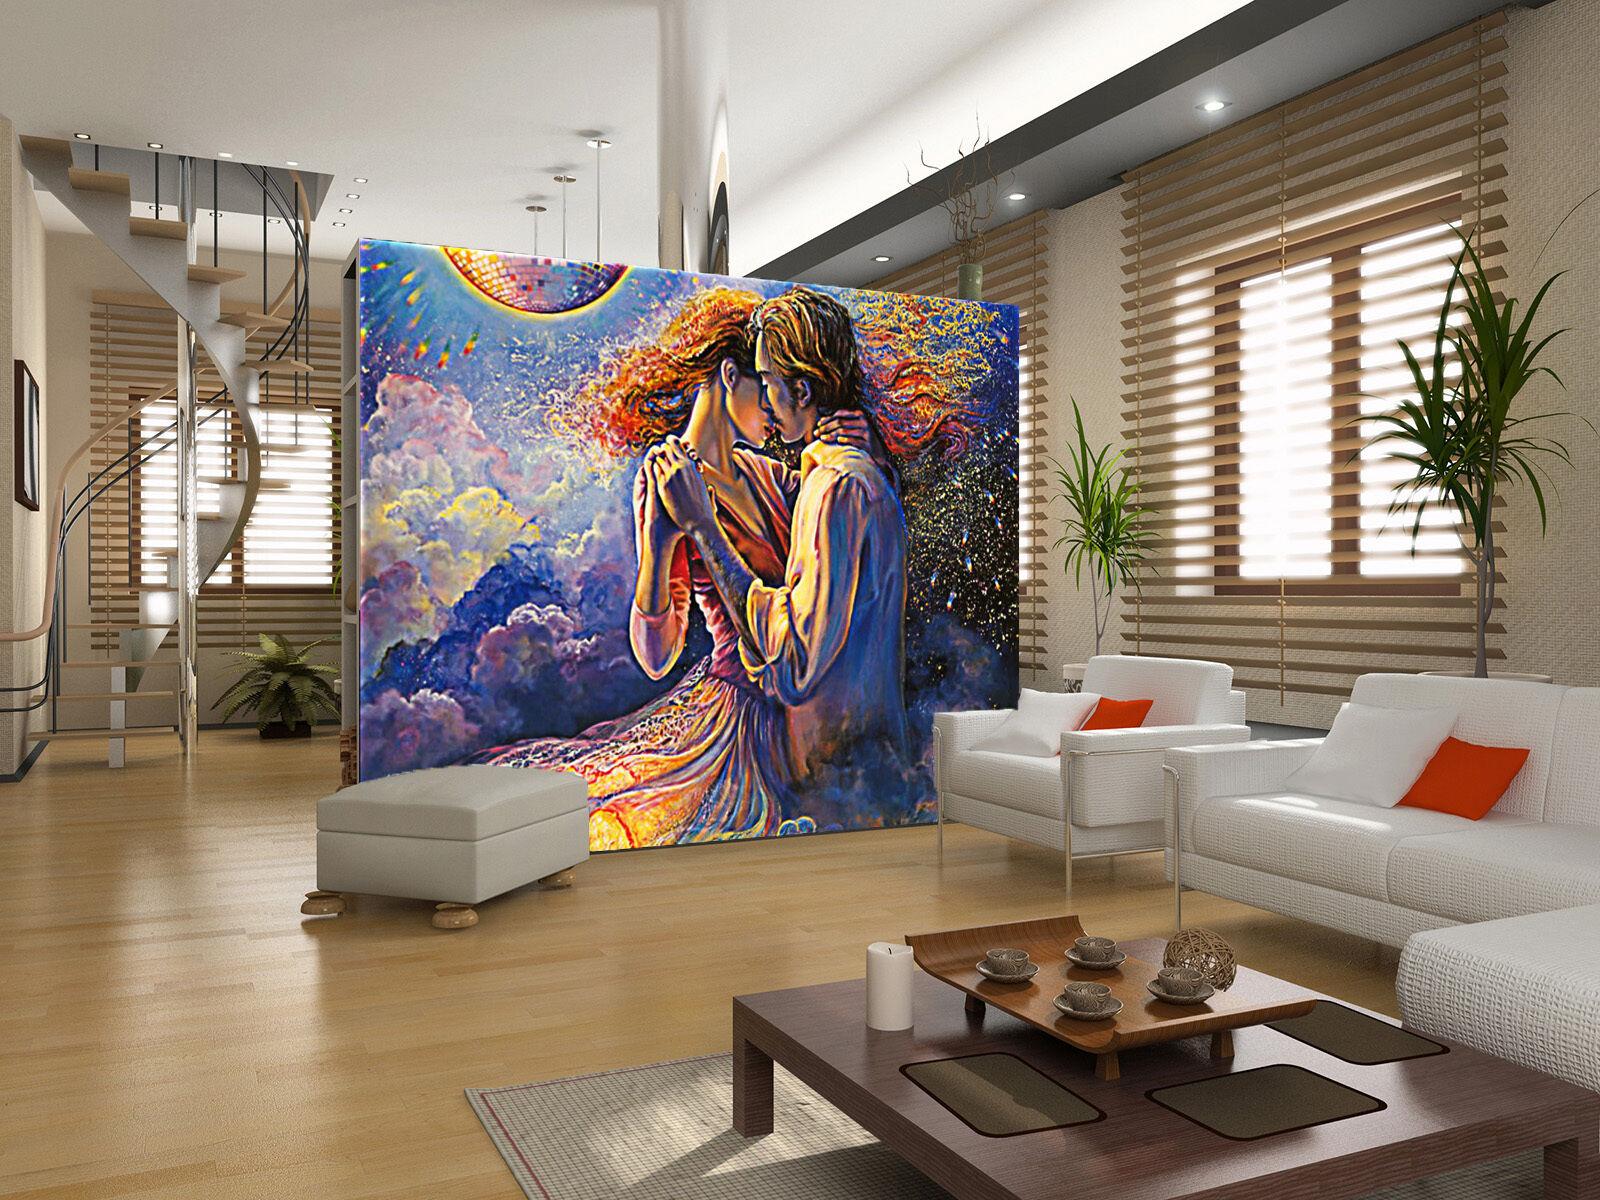 3D Luminous dancing Wall Paper wall Print Decal Wall Deco Indoor wall Mural